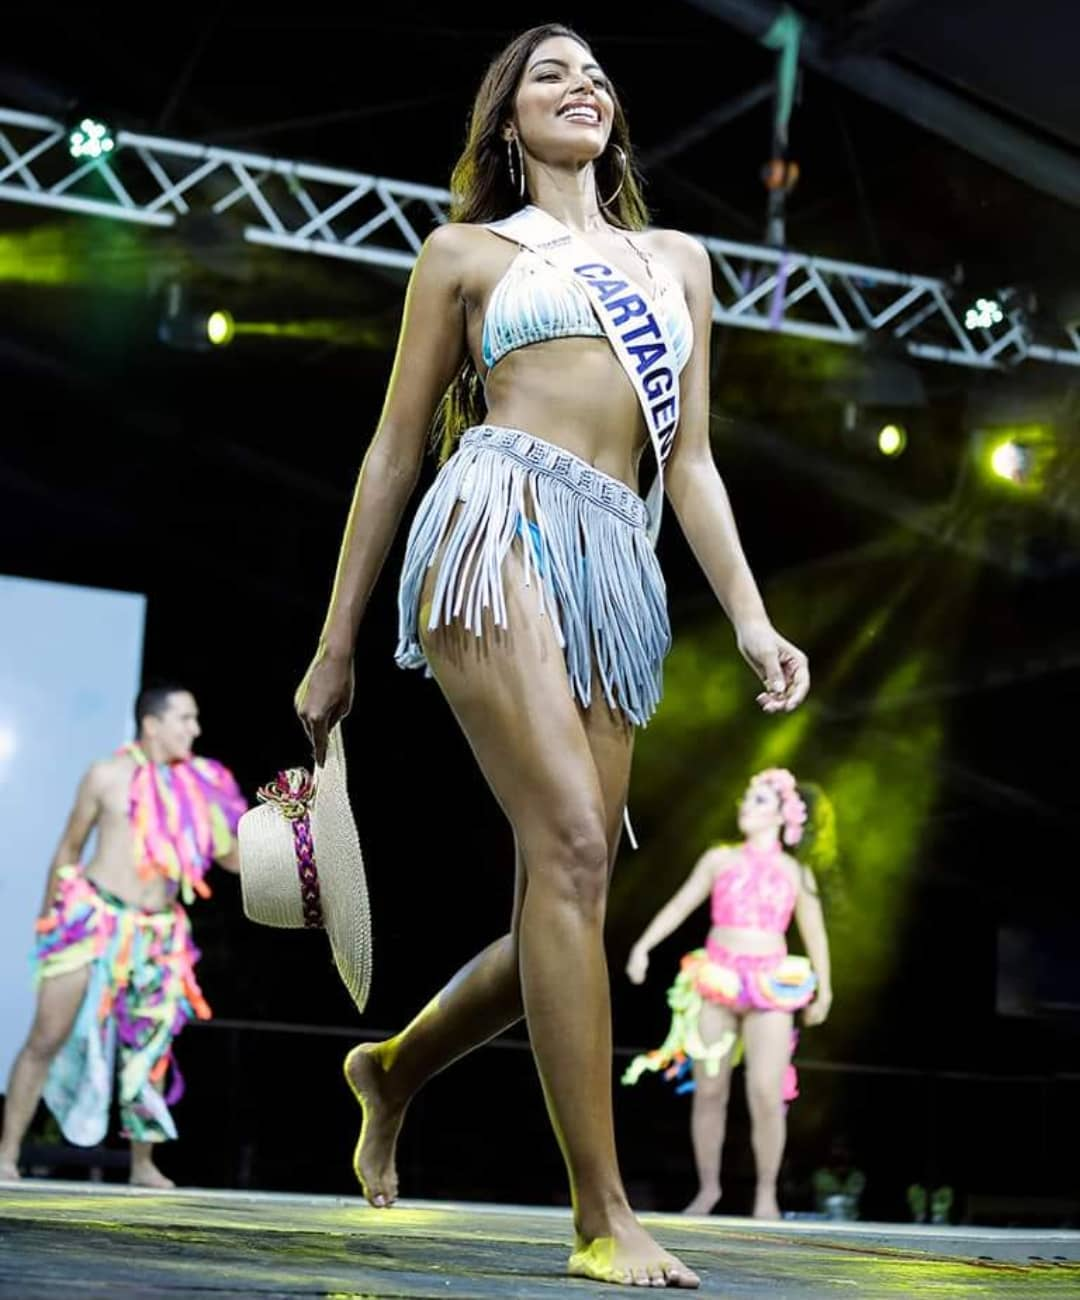 valeria ayos bossa, miss universe colombia 2021/miss water earth 2018. - Página 21 24120619